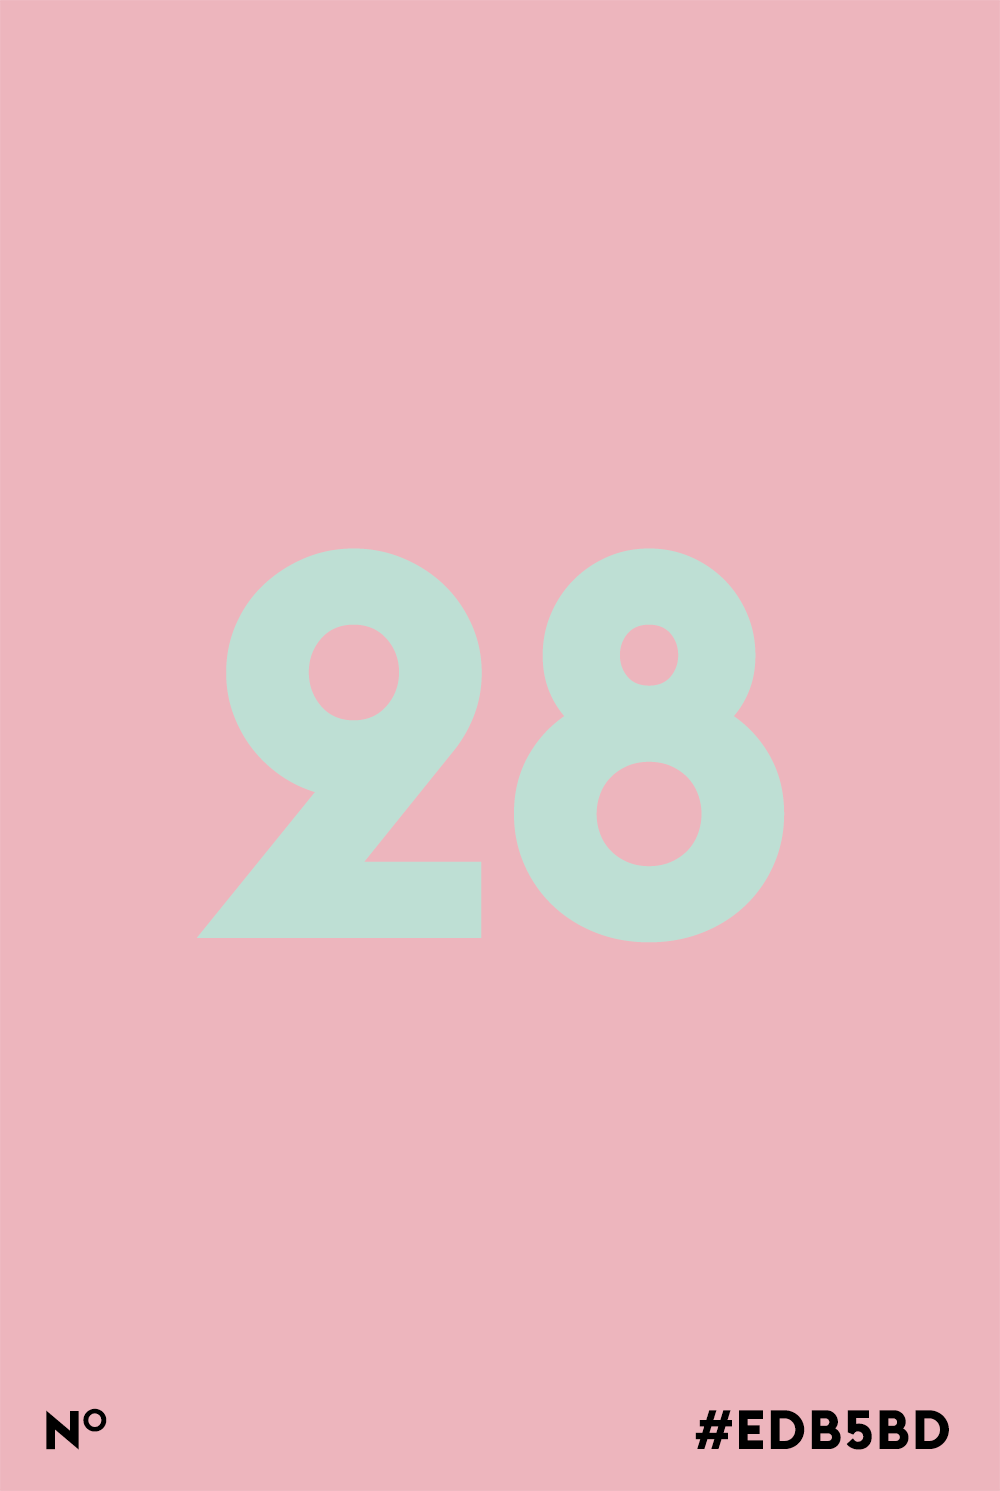 cc_0027_28